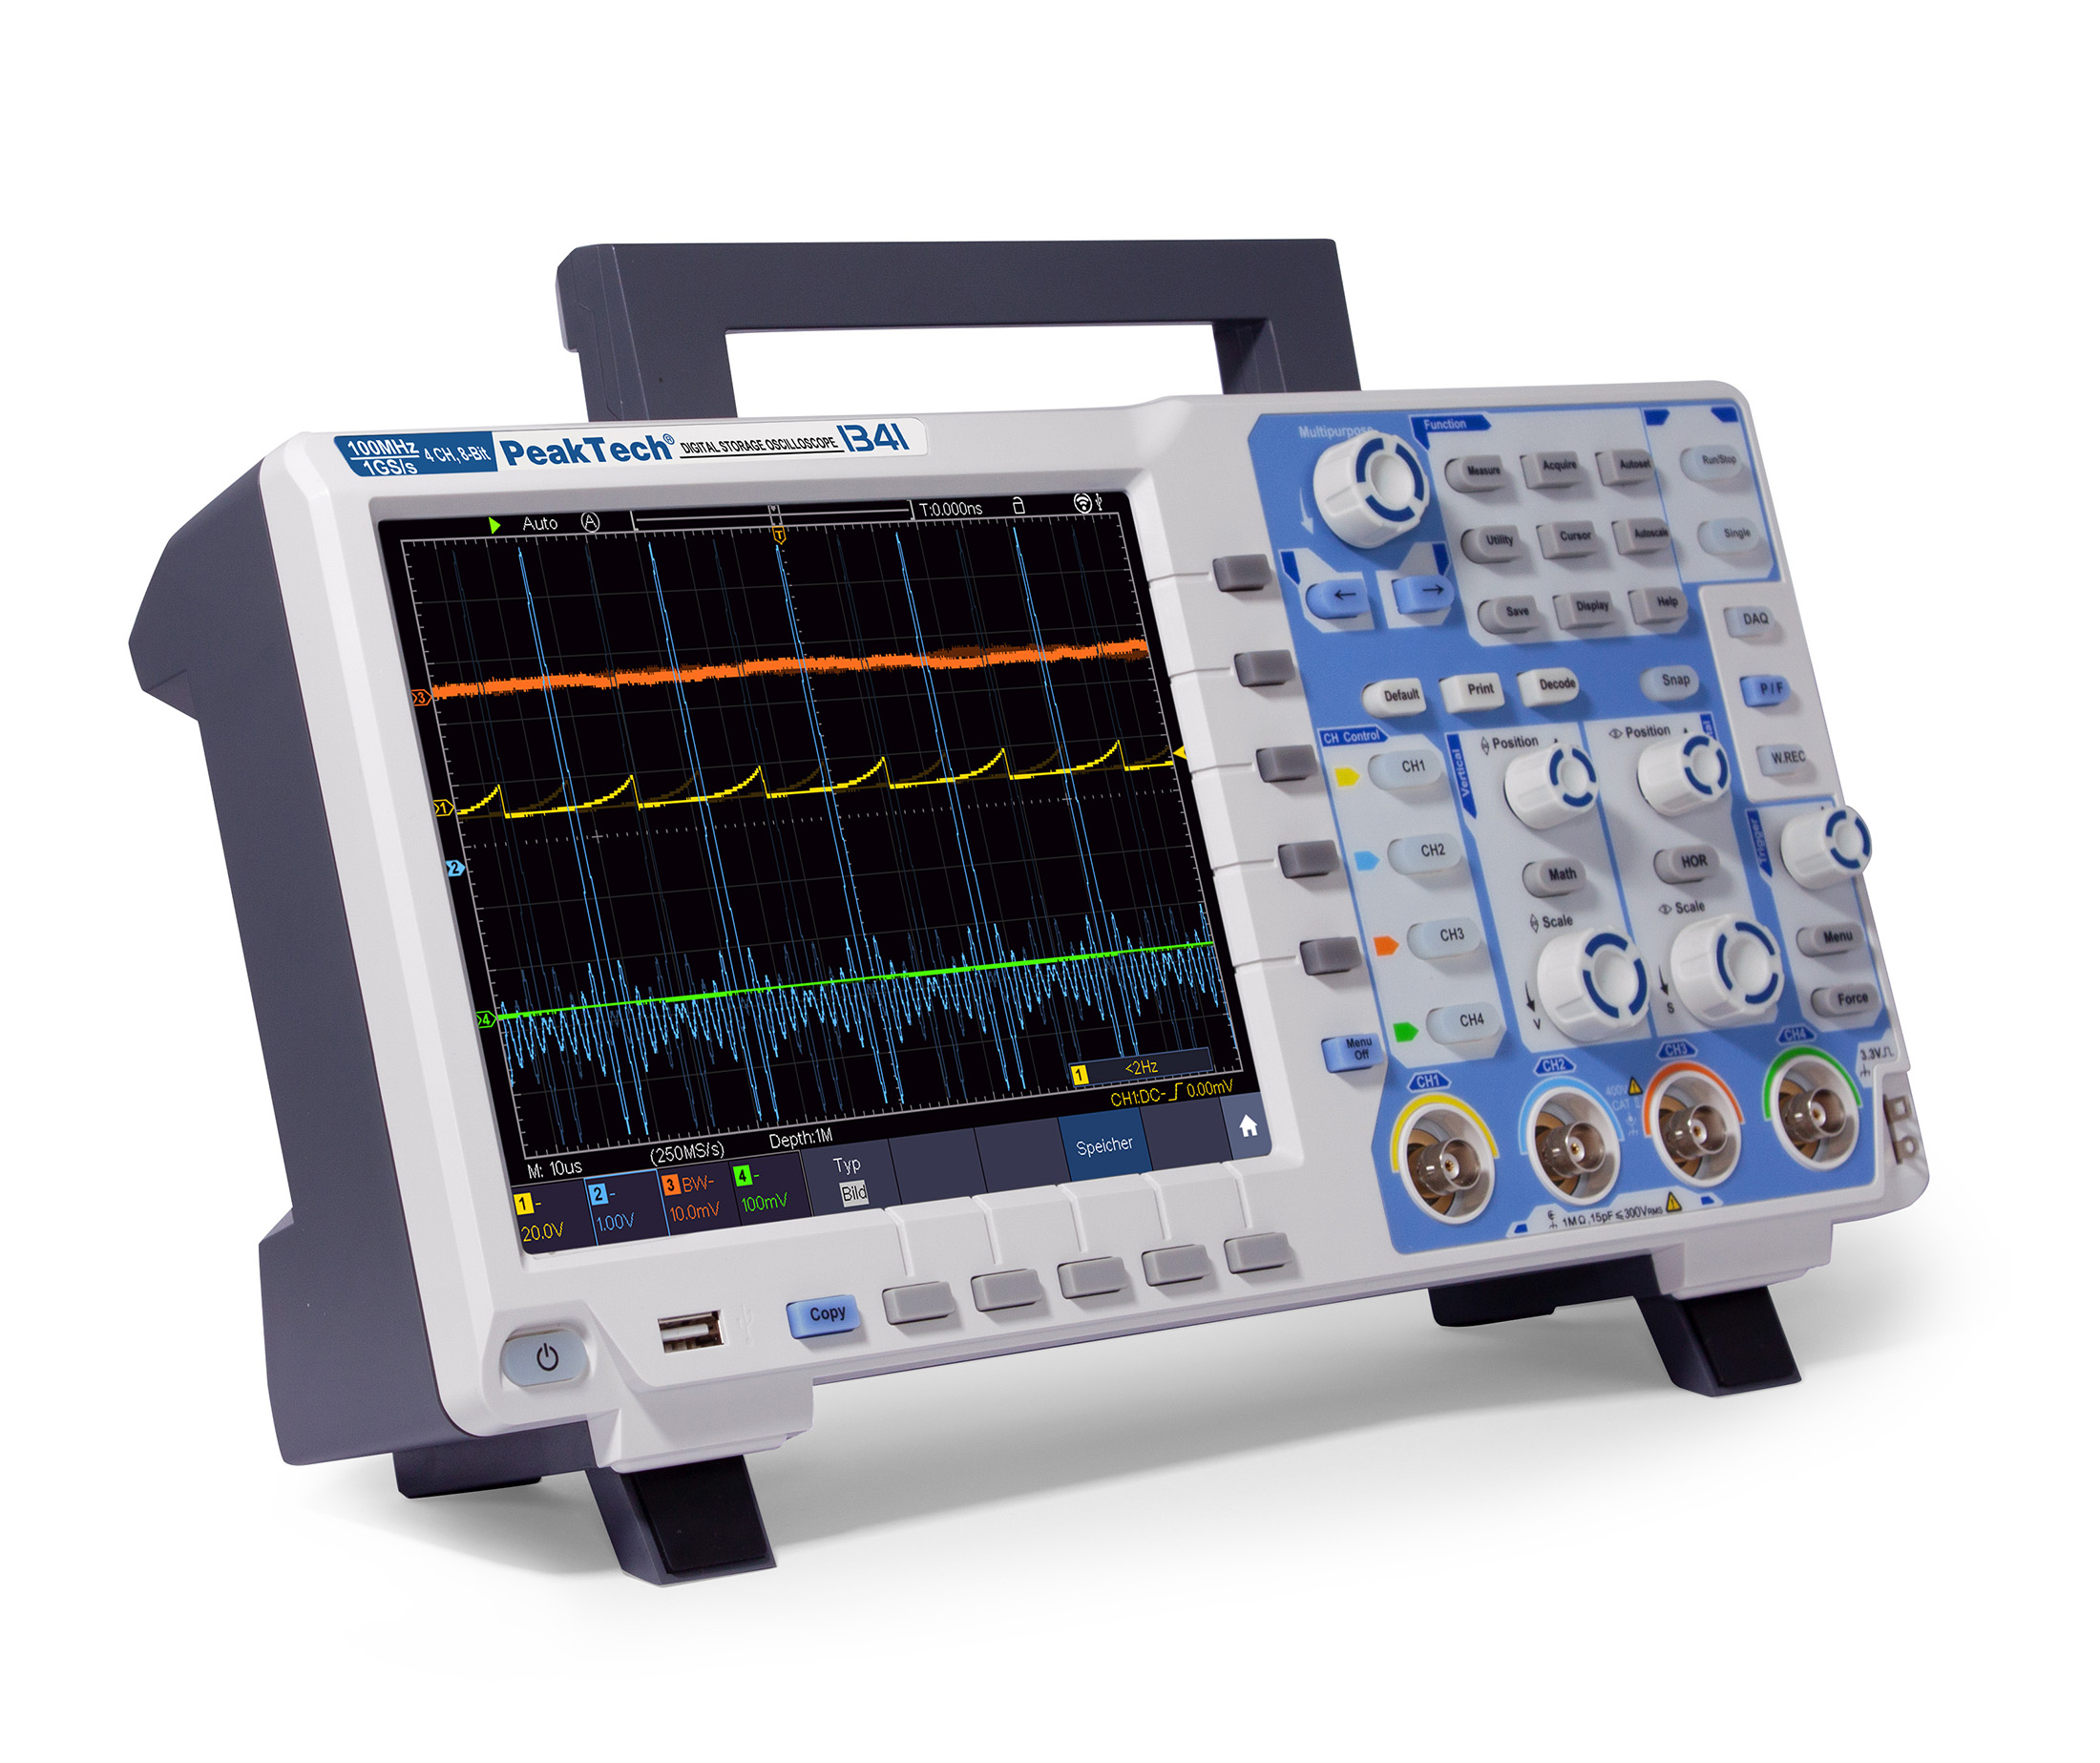 «PeakTech® P 1341» 100 MHz /4 CH, 1 GS/s digital storage oscilloscope